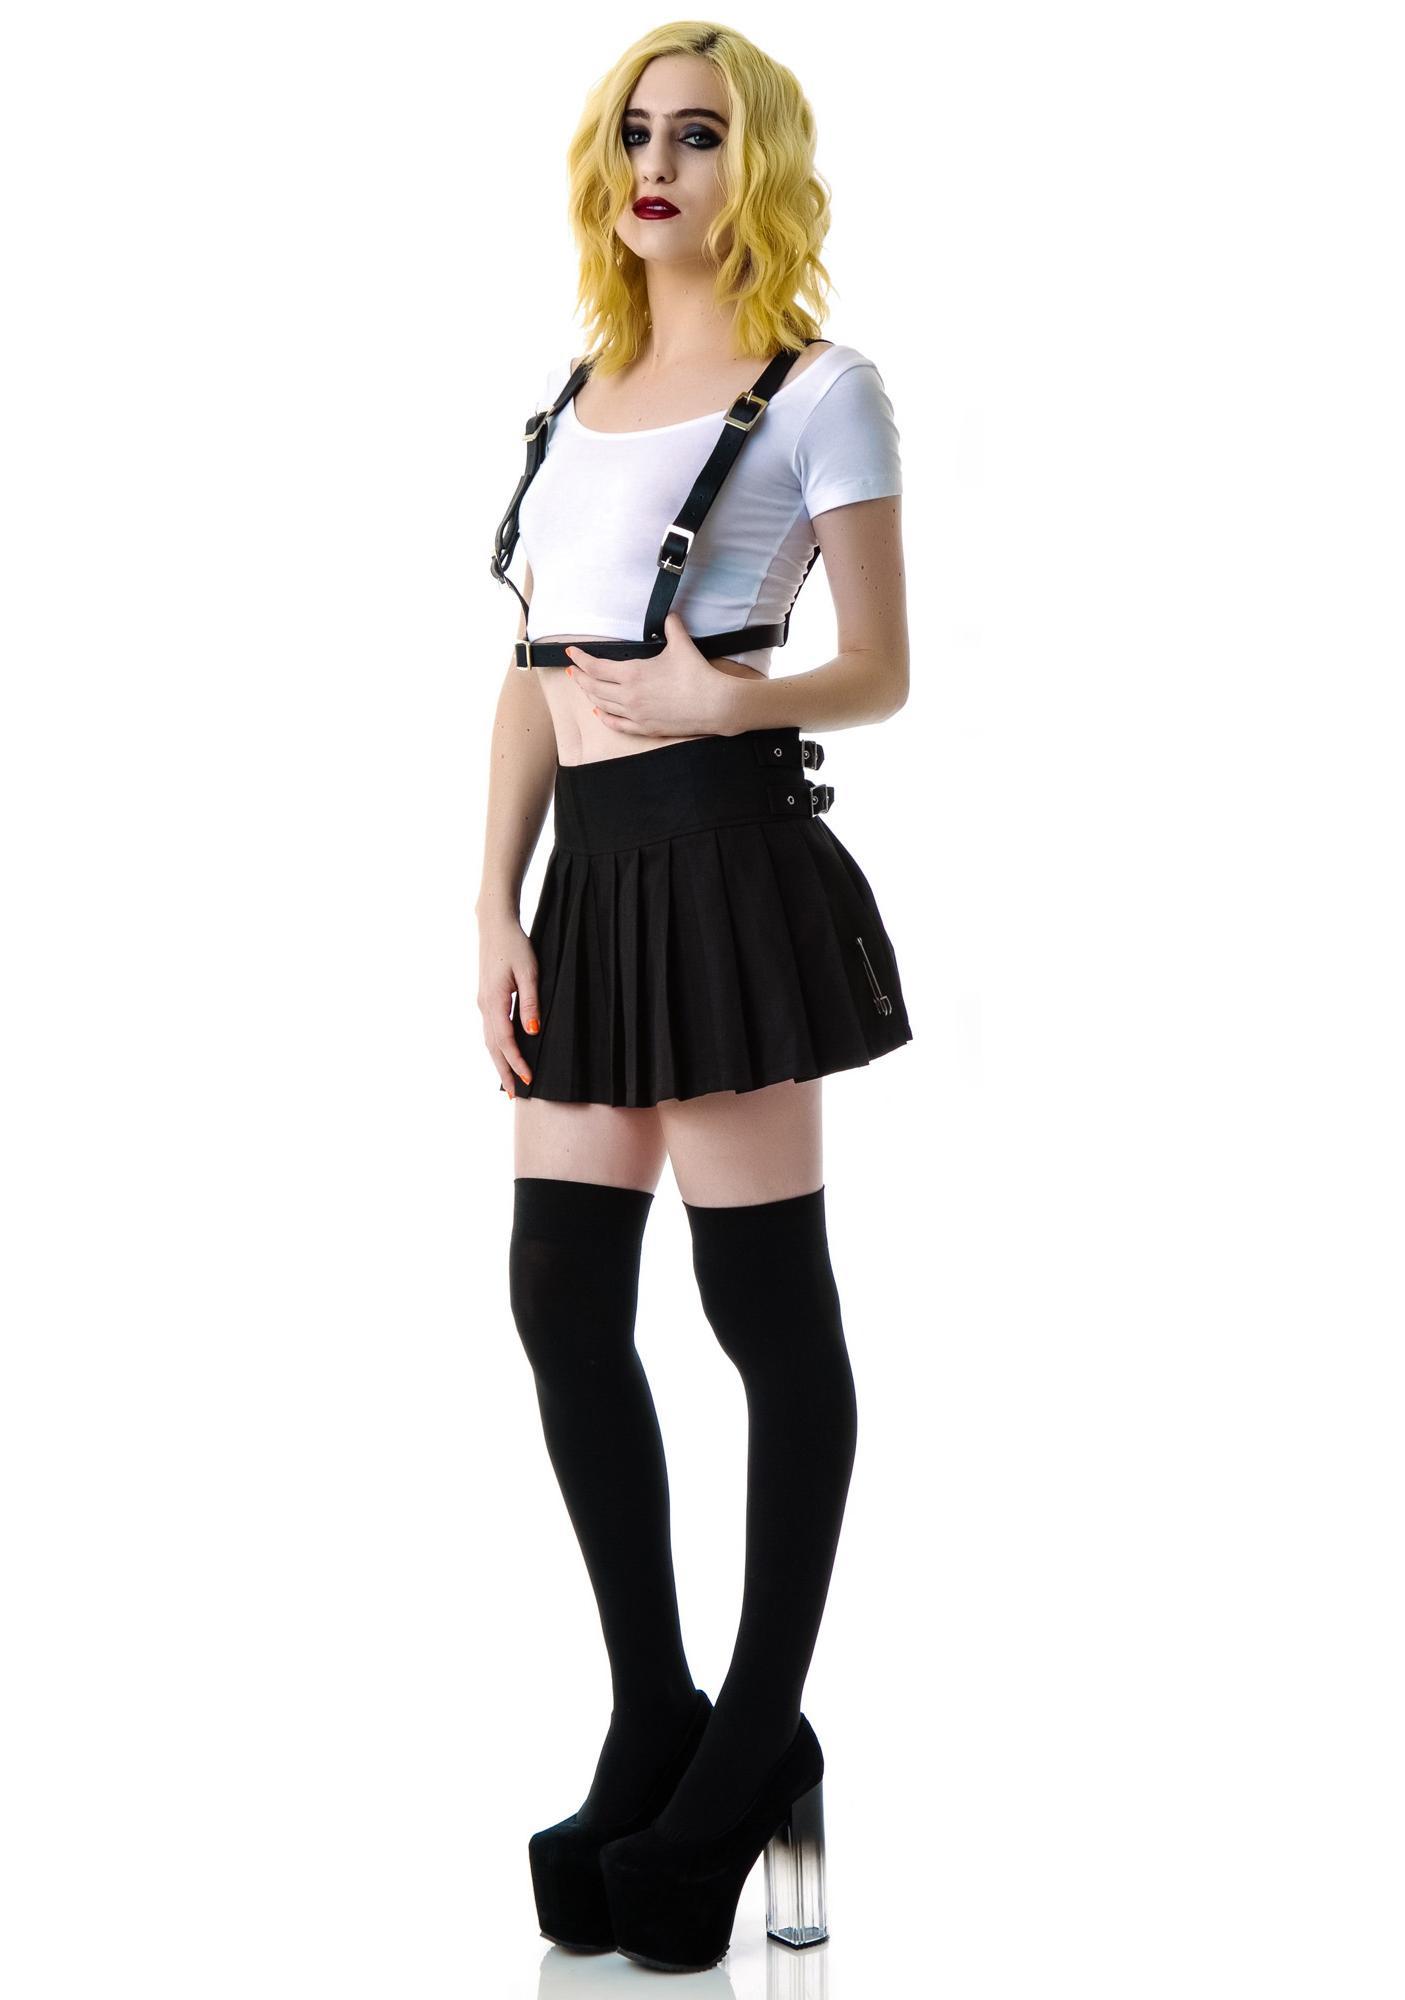 Suspender Belt Harness